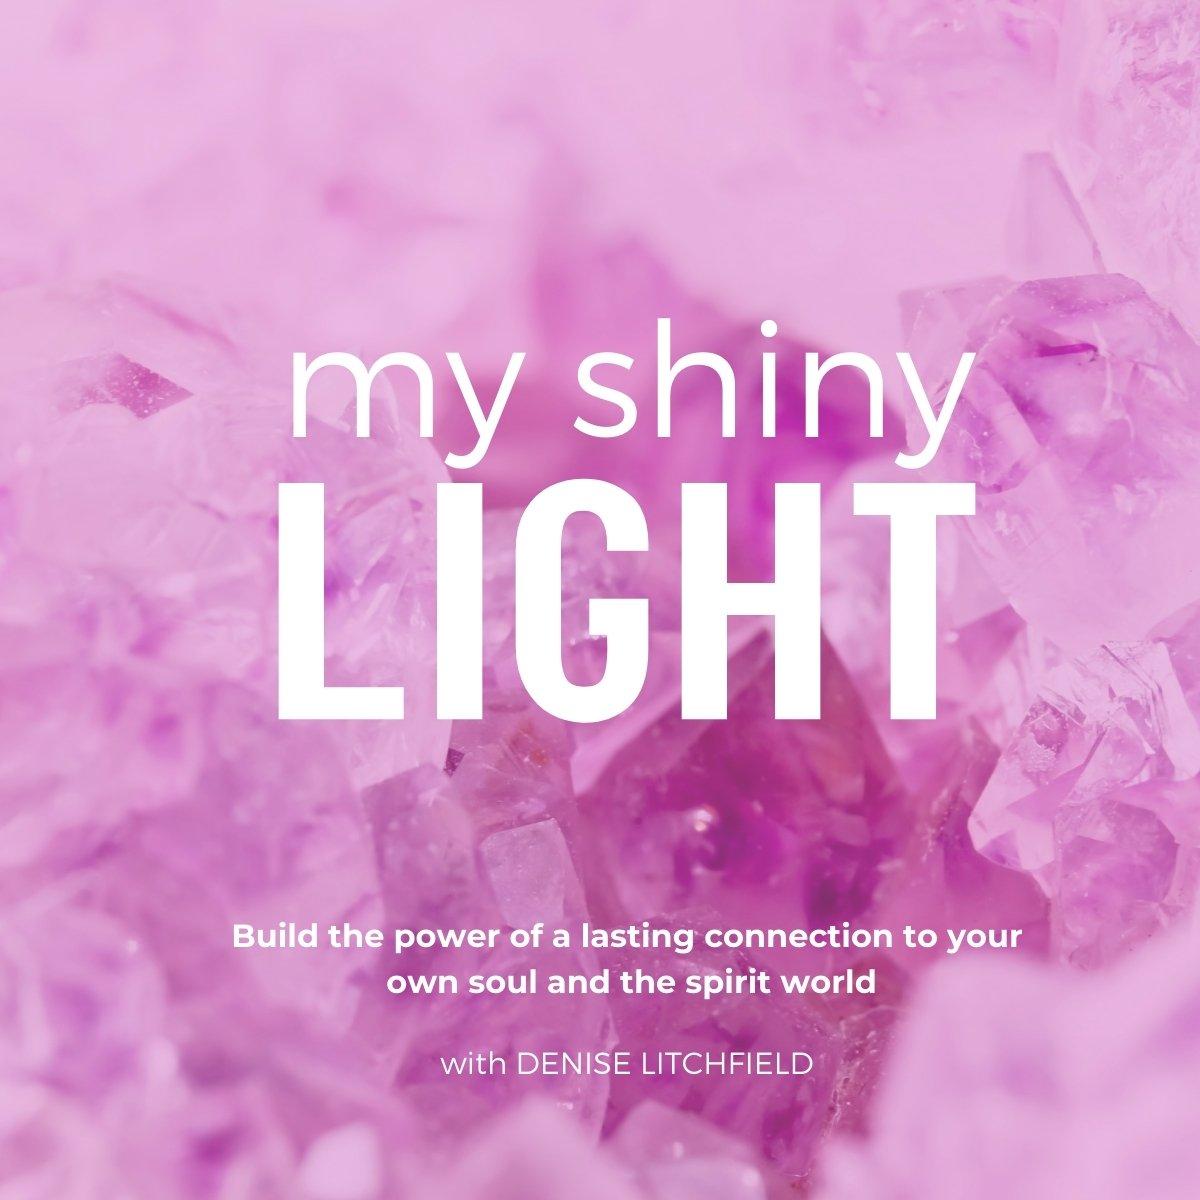 My shiny light